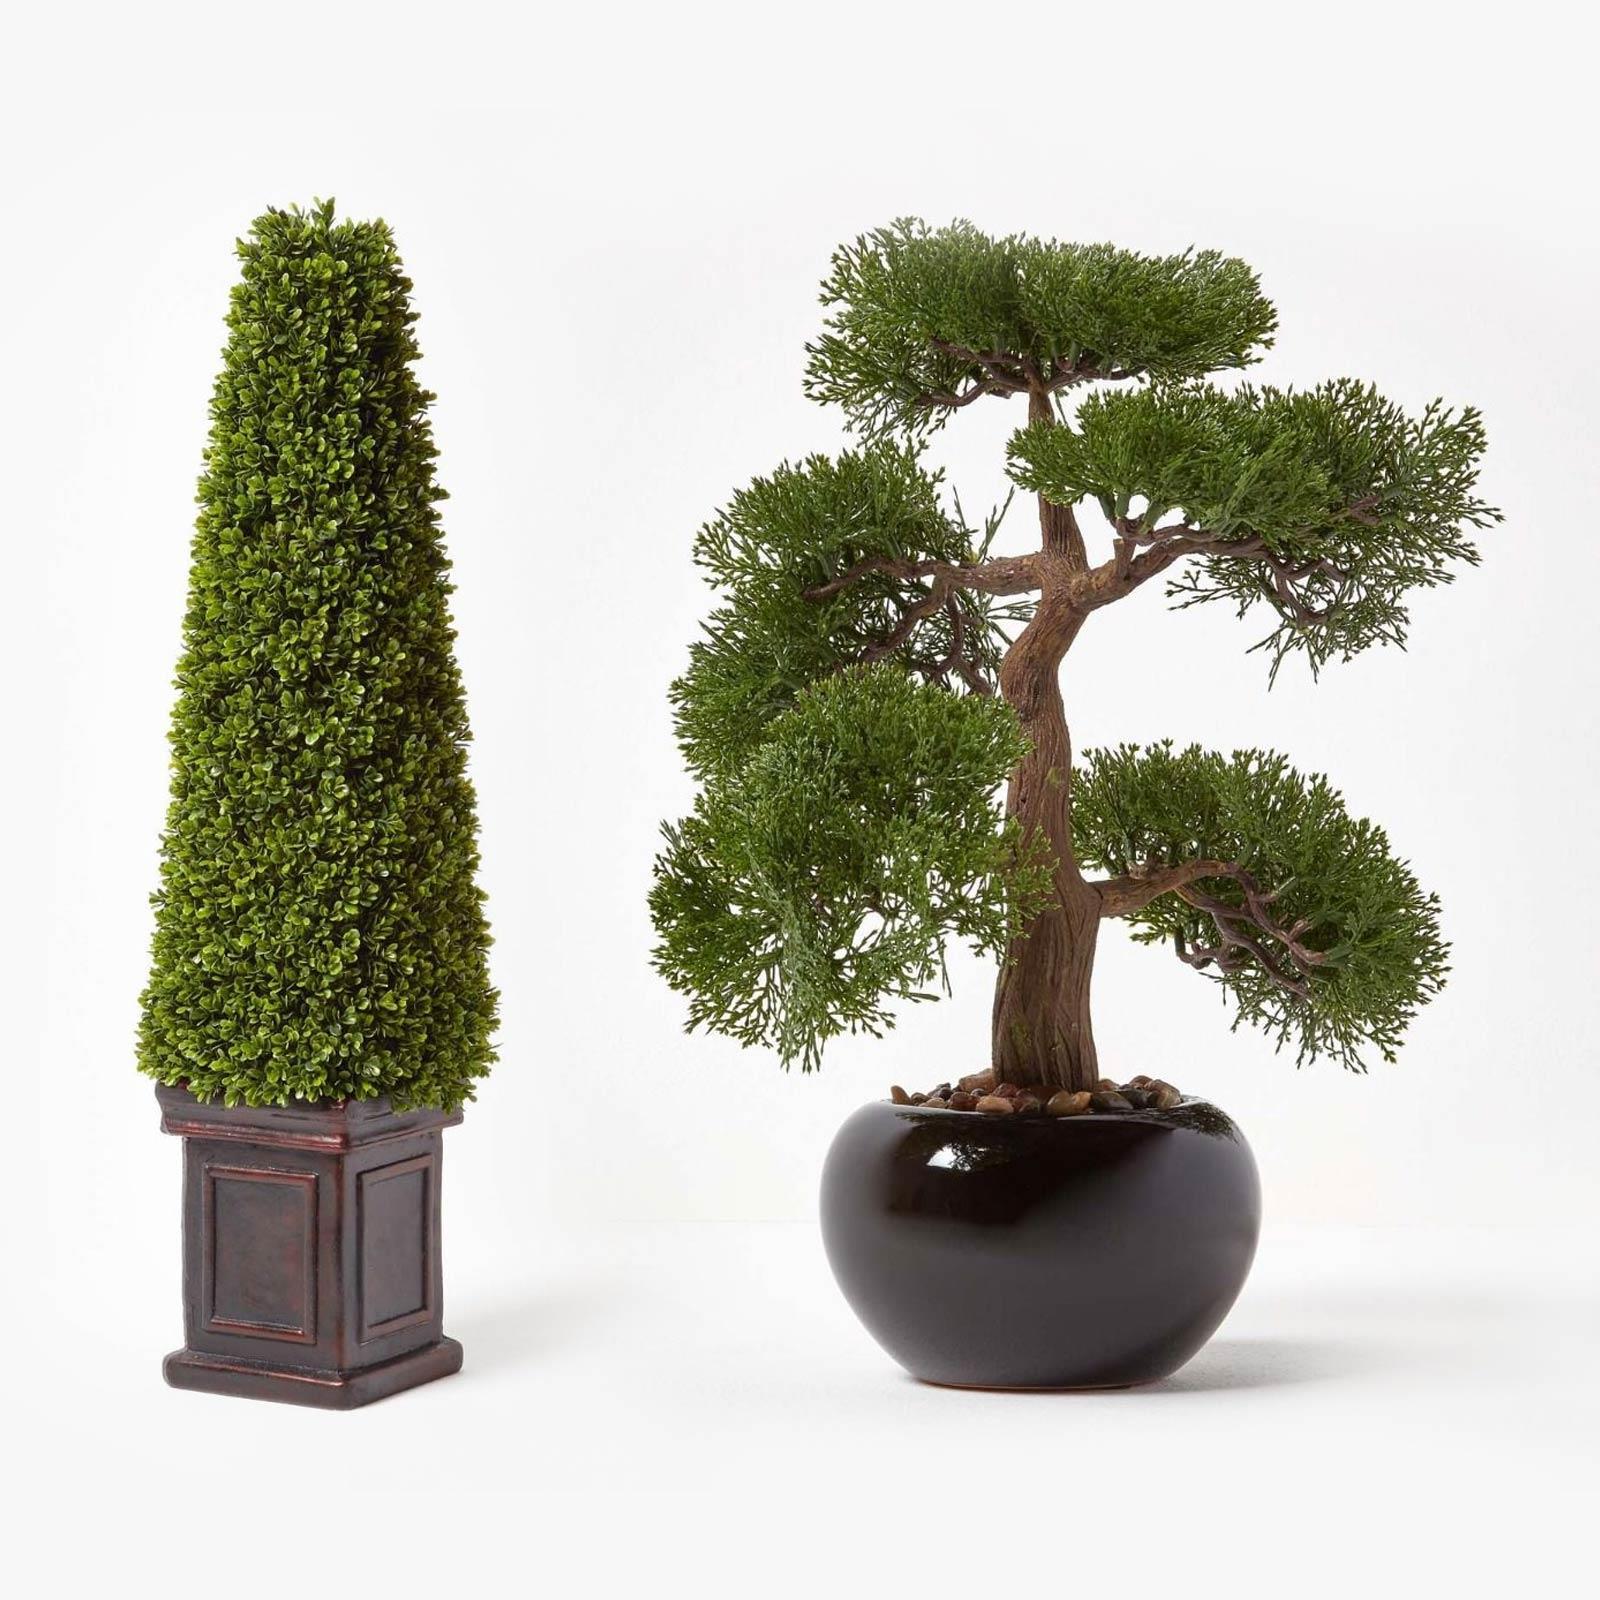 Artificial Potted Ornament Topiary Ball Shape Bonsai Fake Plant Home Decor Ture